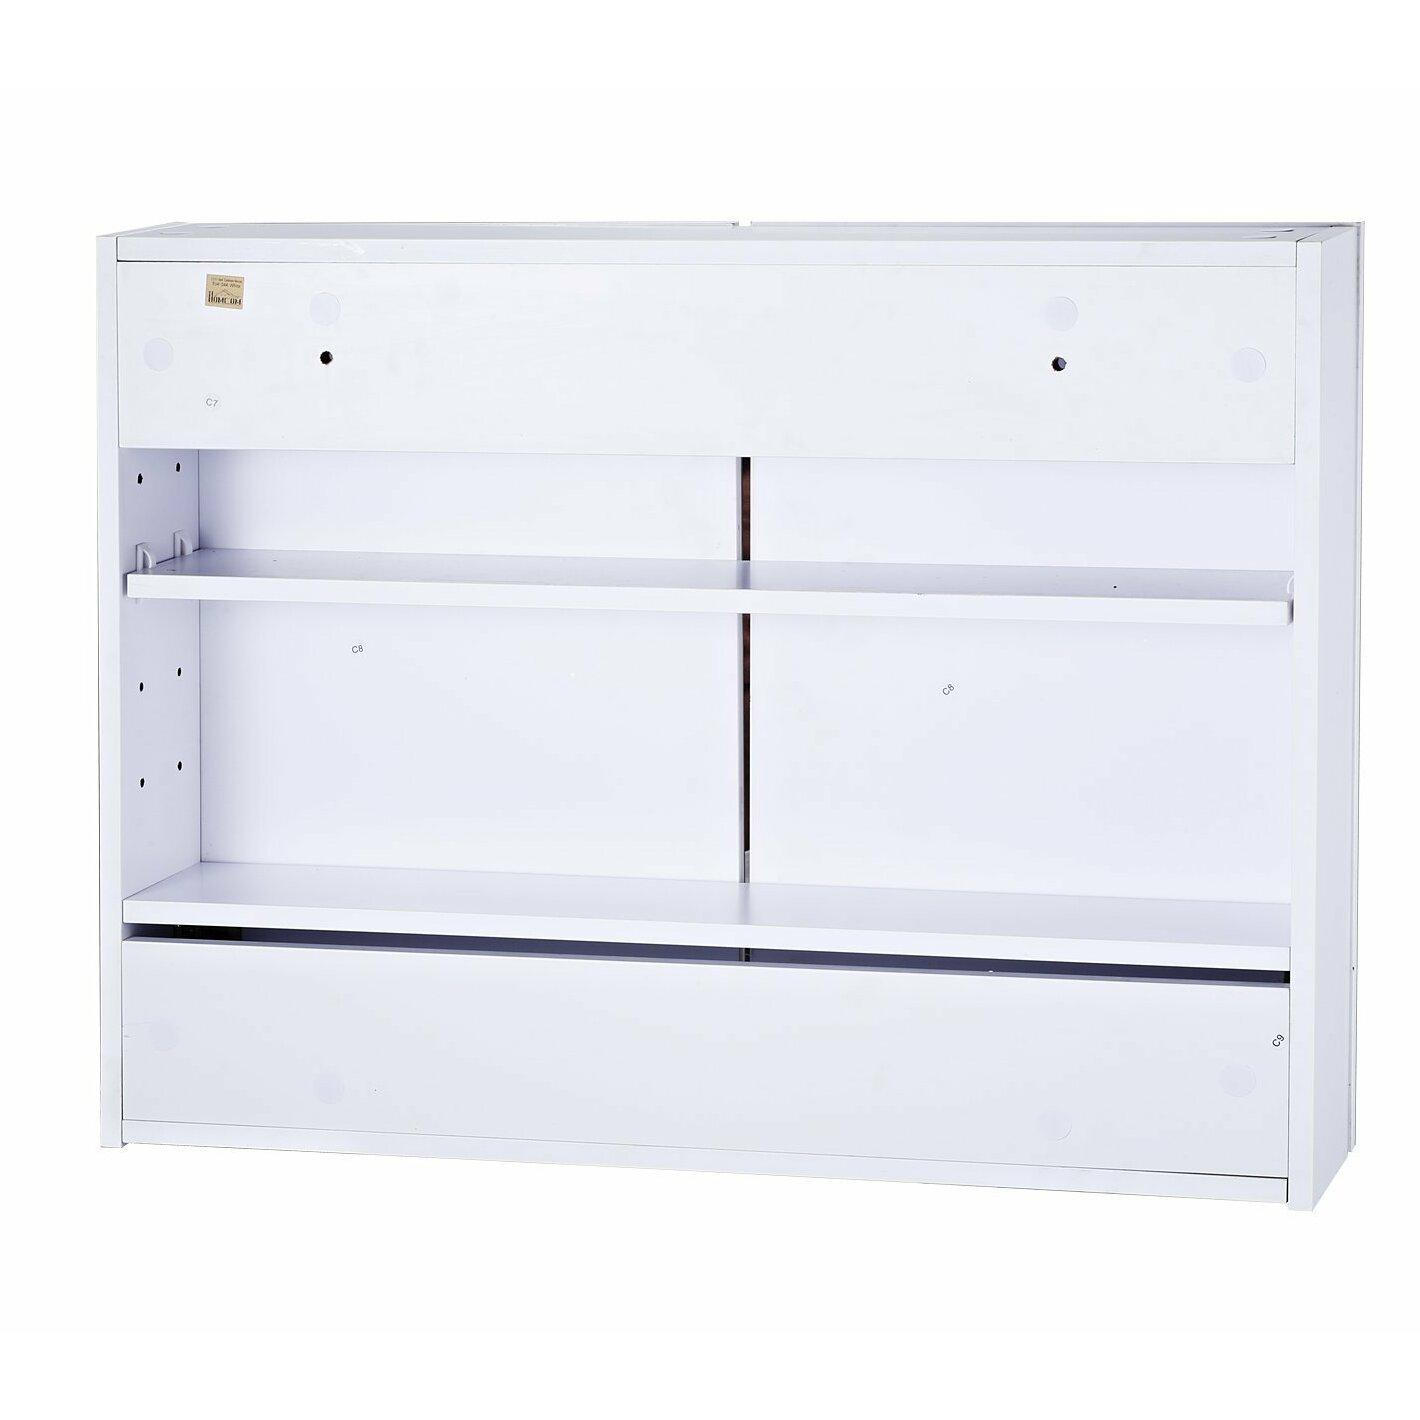 Homcom 60cm x 80cm surface mount flat mirror cabinet for Mirror 60cm x 80cm